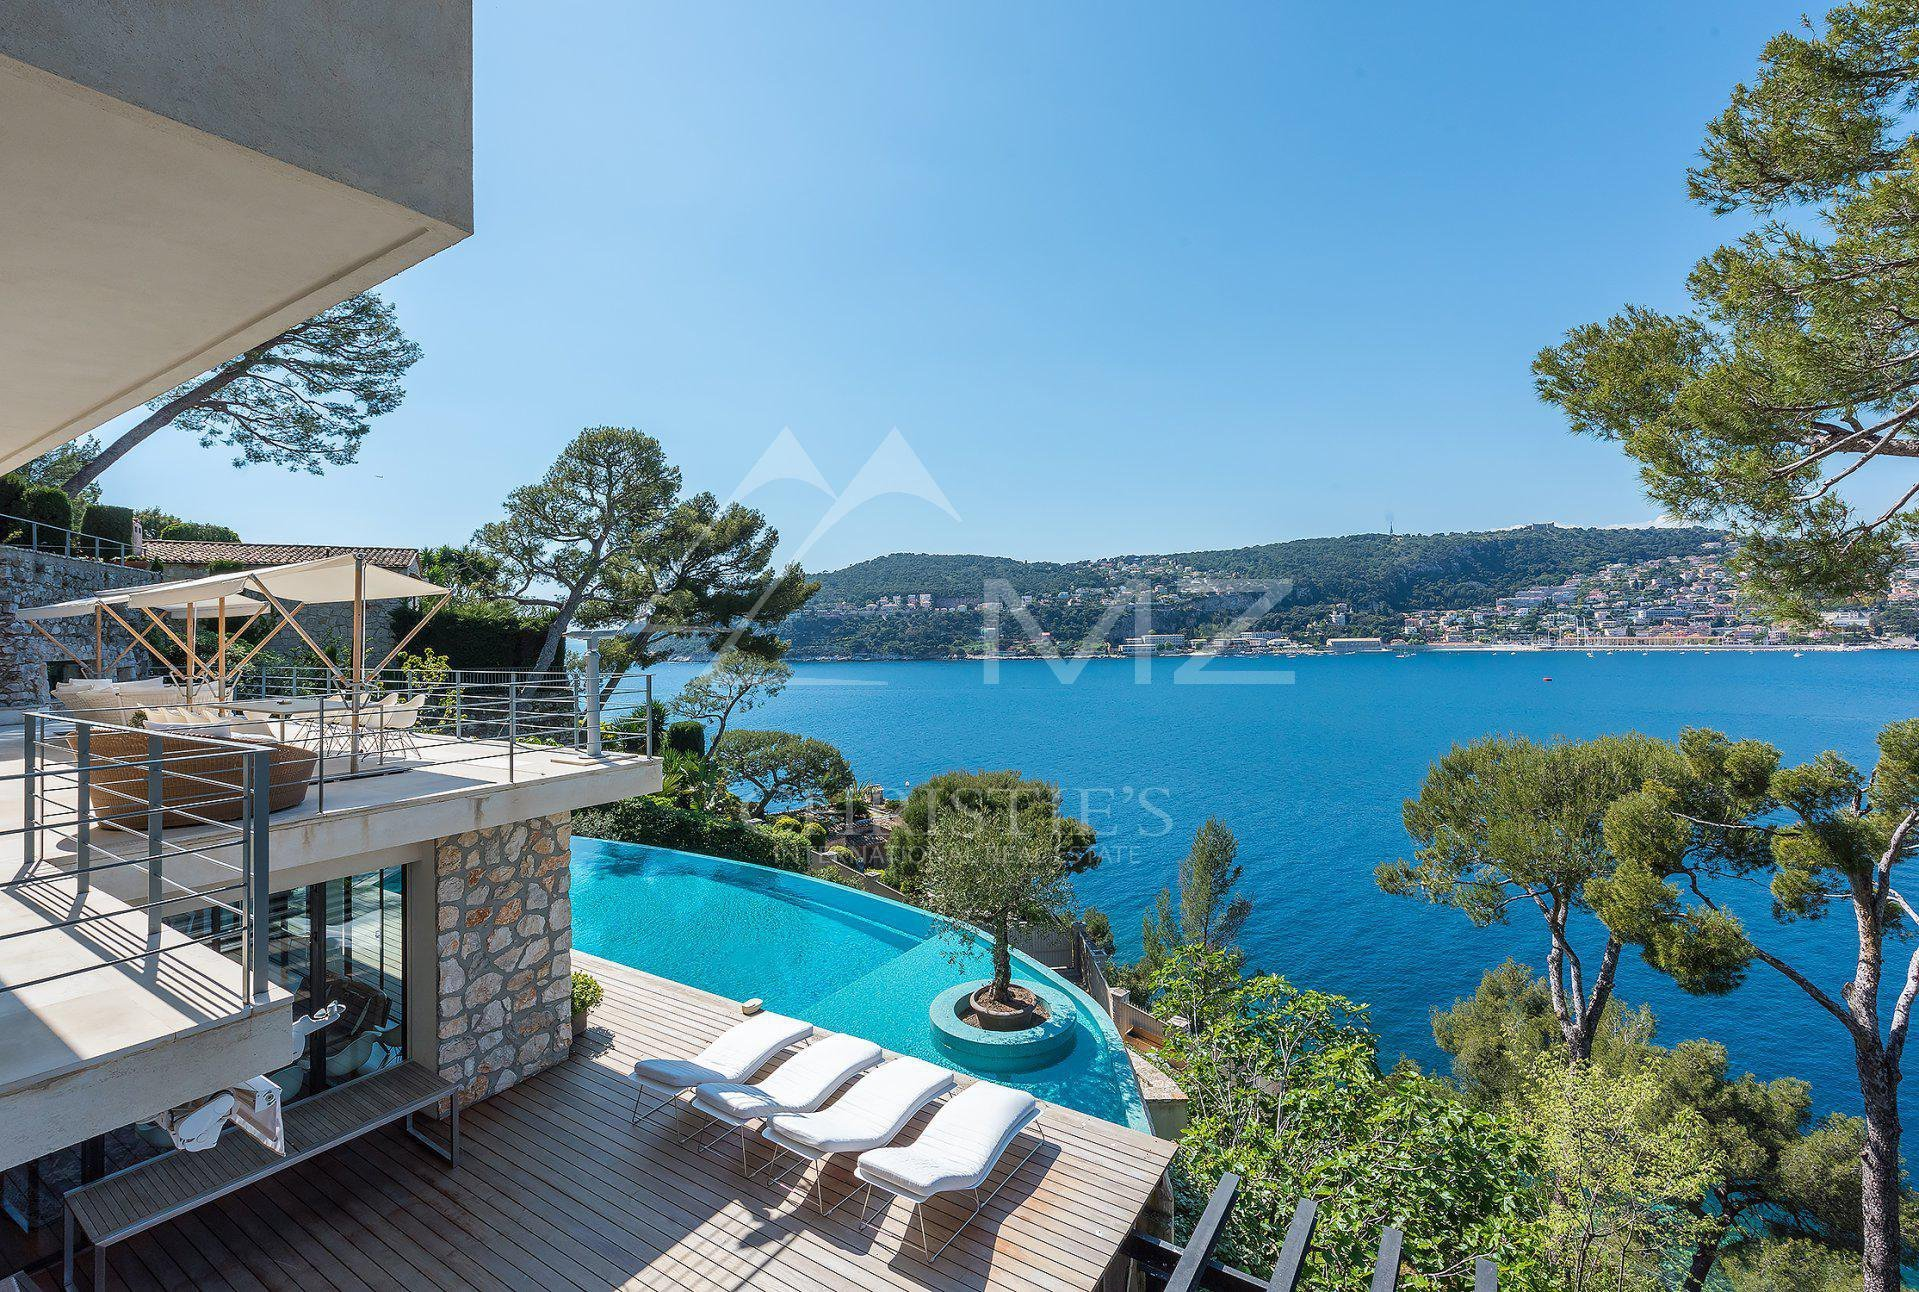 Villa in Saint-Jean-Cap-Ferrat, Provence-Alpes-Côte d'Azur, France 1 - 10762801